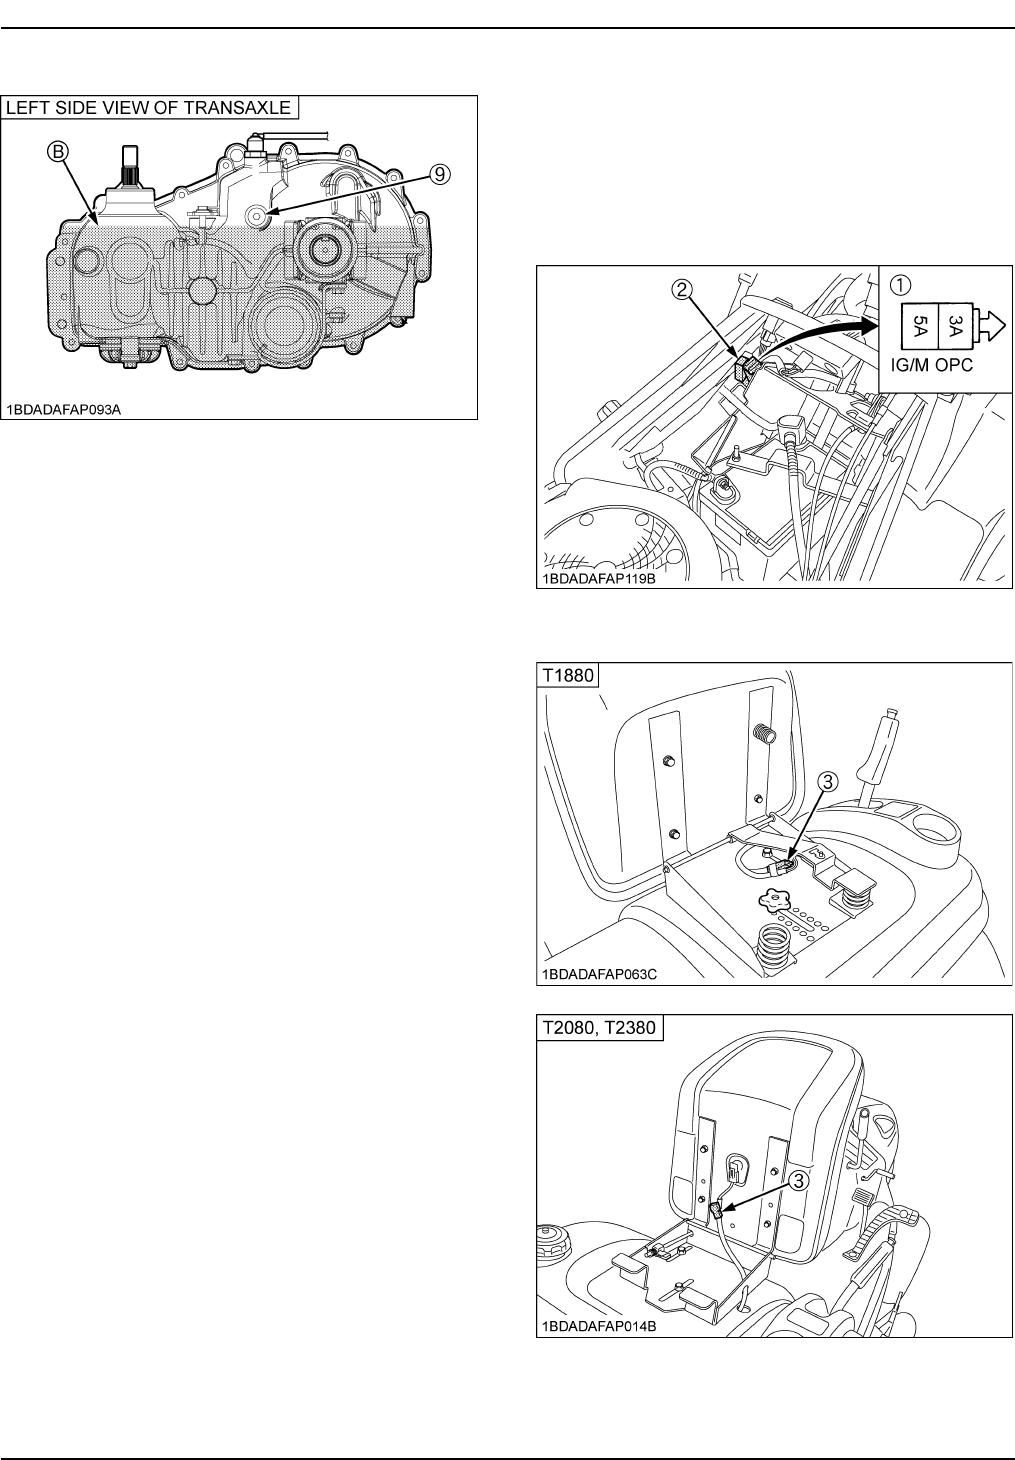 Strange Handleiding Kubota T1880 Pagina 68 Van 78 English Wiring 101 Olytiaxxcnl